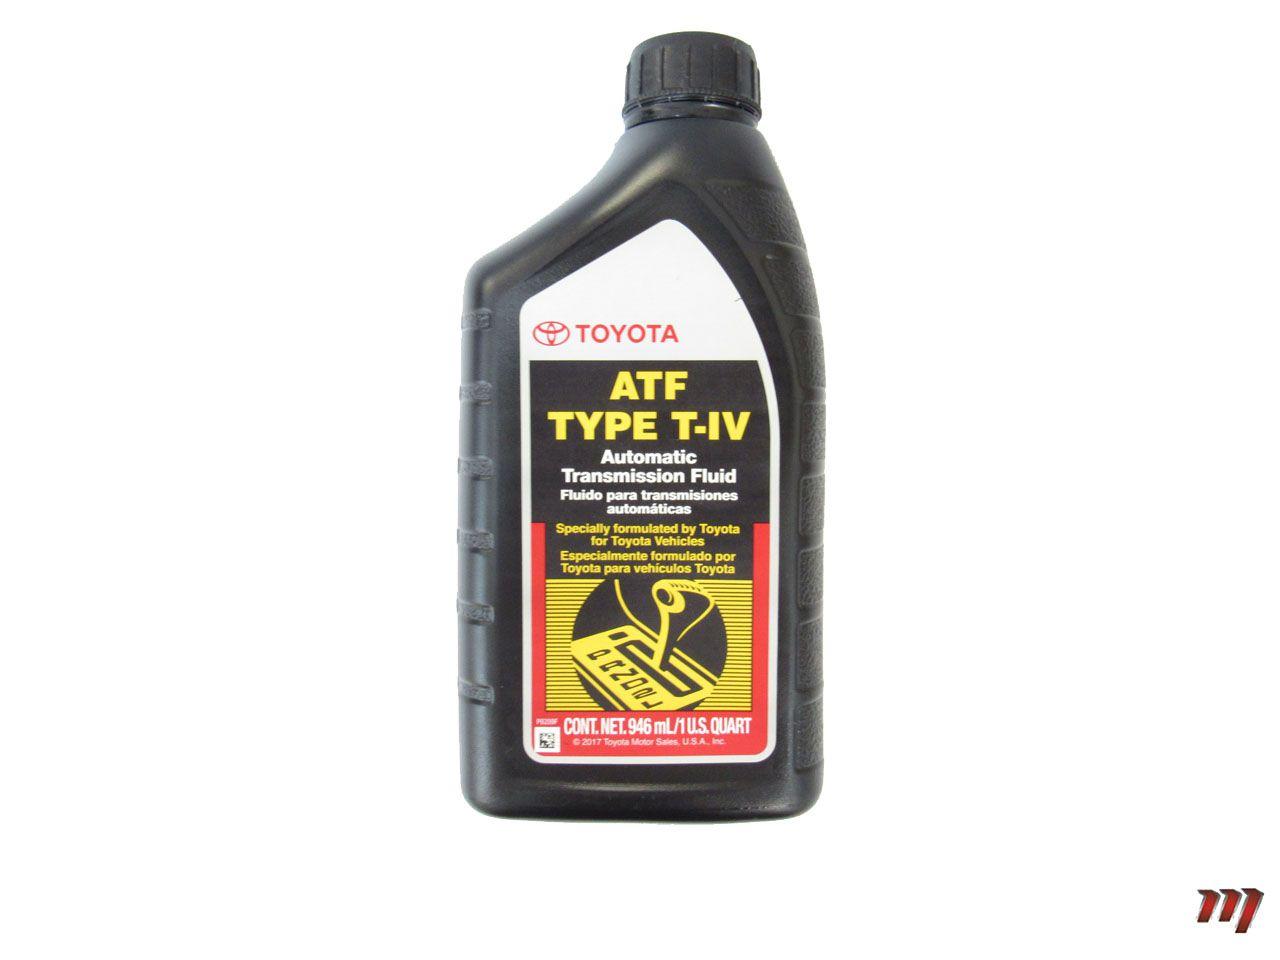 Óleo ATF Type T-IV Fluído Transmissão Automática  - Mirai Peças Toyota